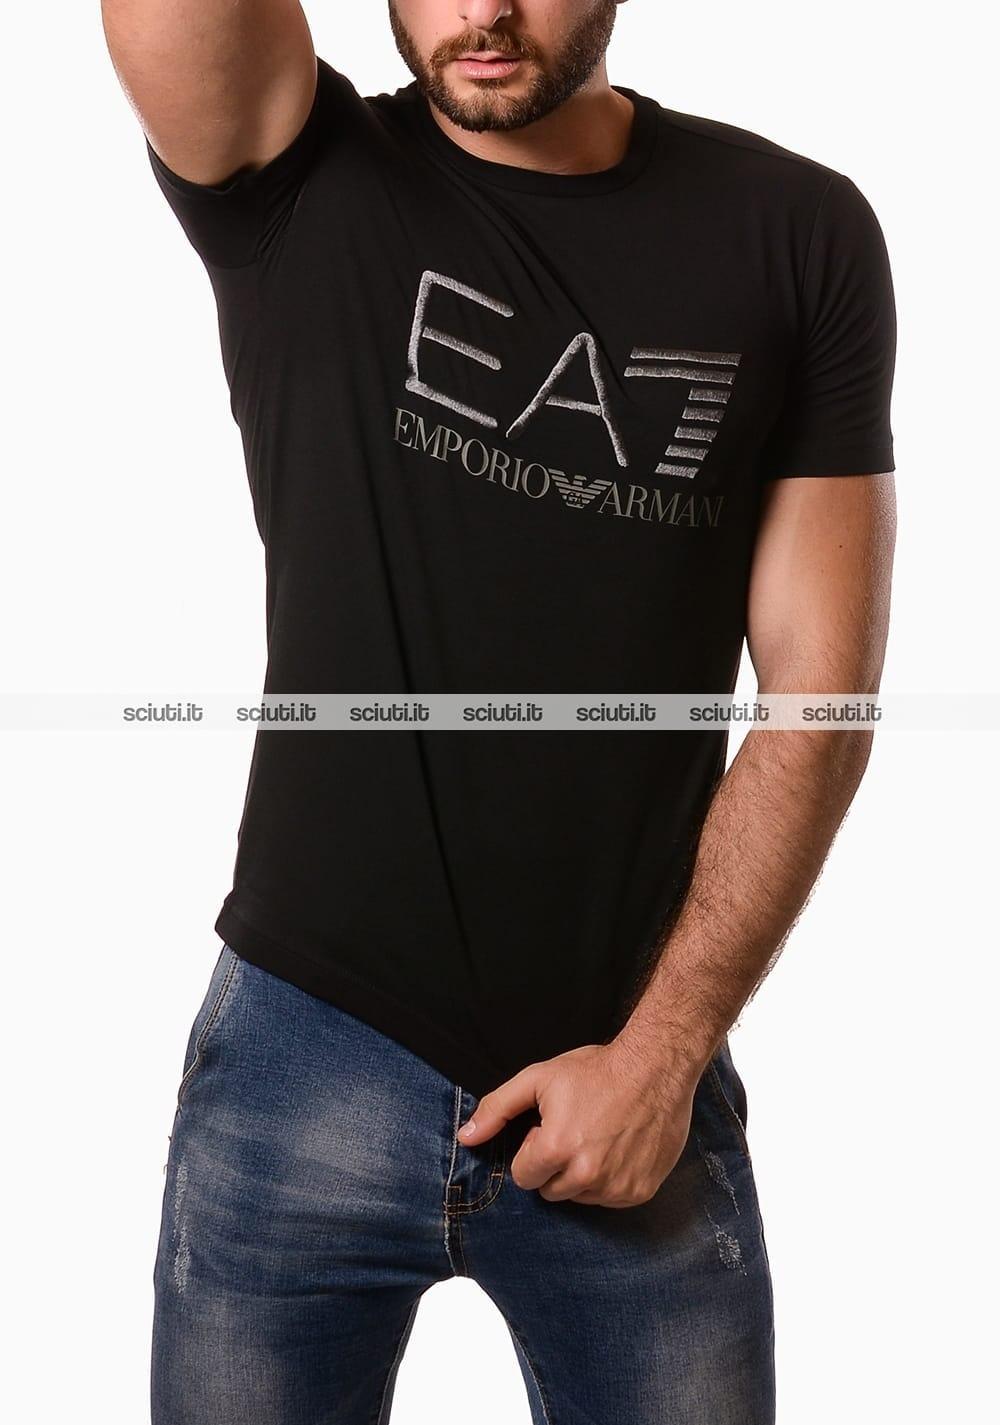 sale retailer cff1d 22ebc Tshirt Emporio Armani uomo logo ricamato nero | Sciuti.it